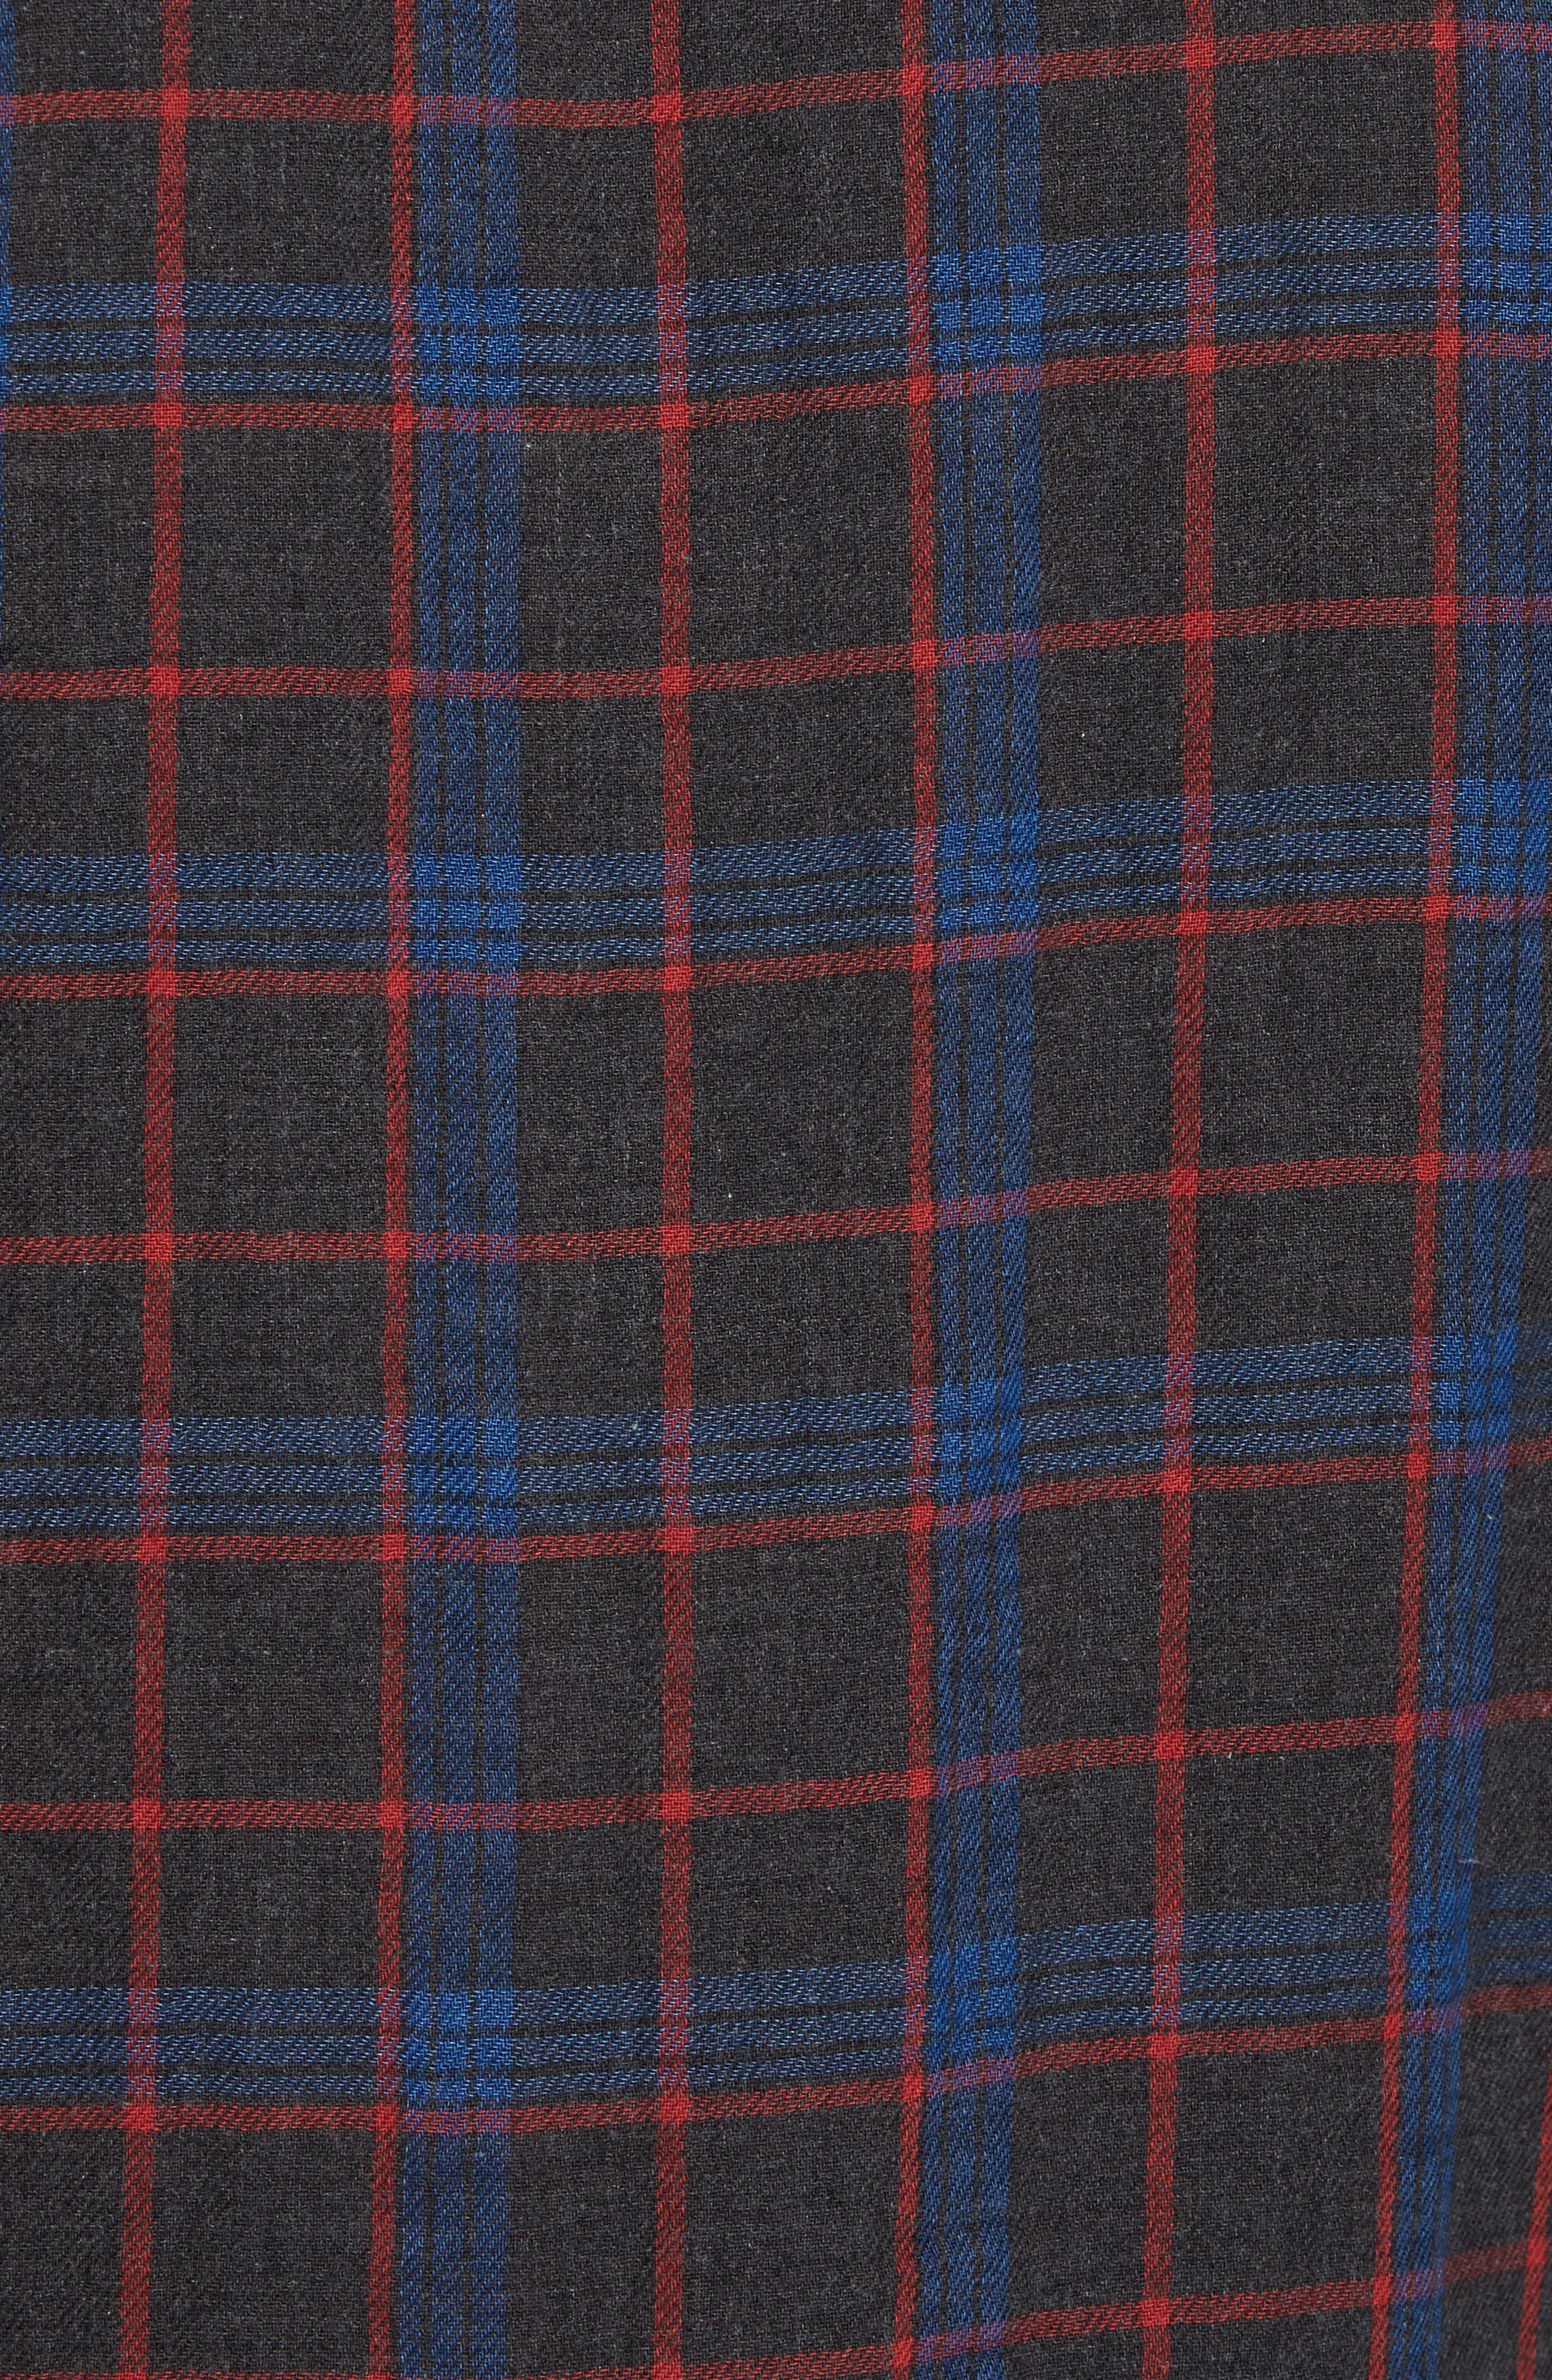 Belmar Plaid Reversible Sport Shirt,                             Alternate thumbnail 6, color,                             Charcoal Blue Red Plaid